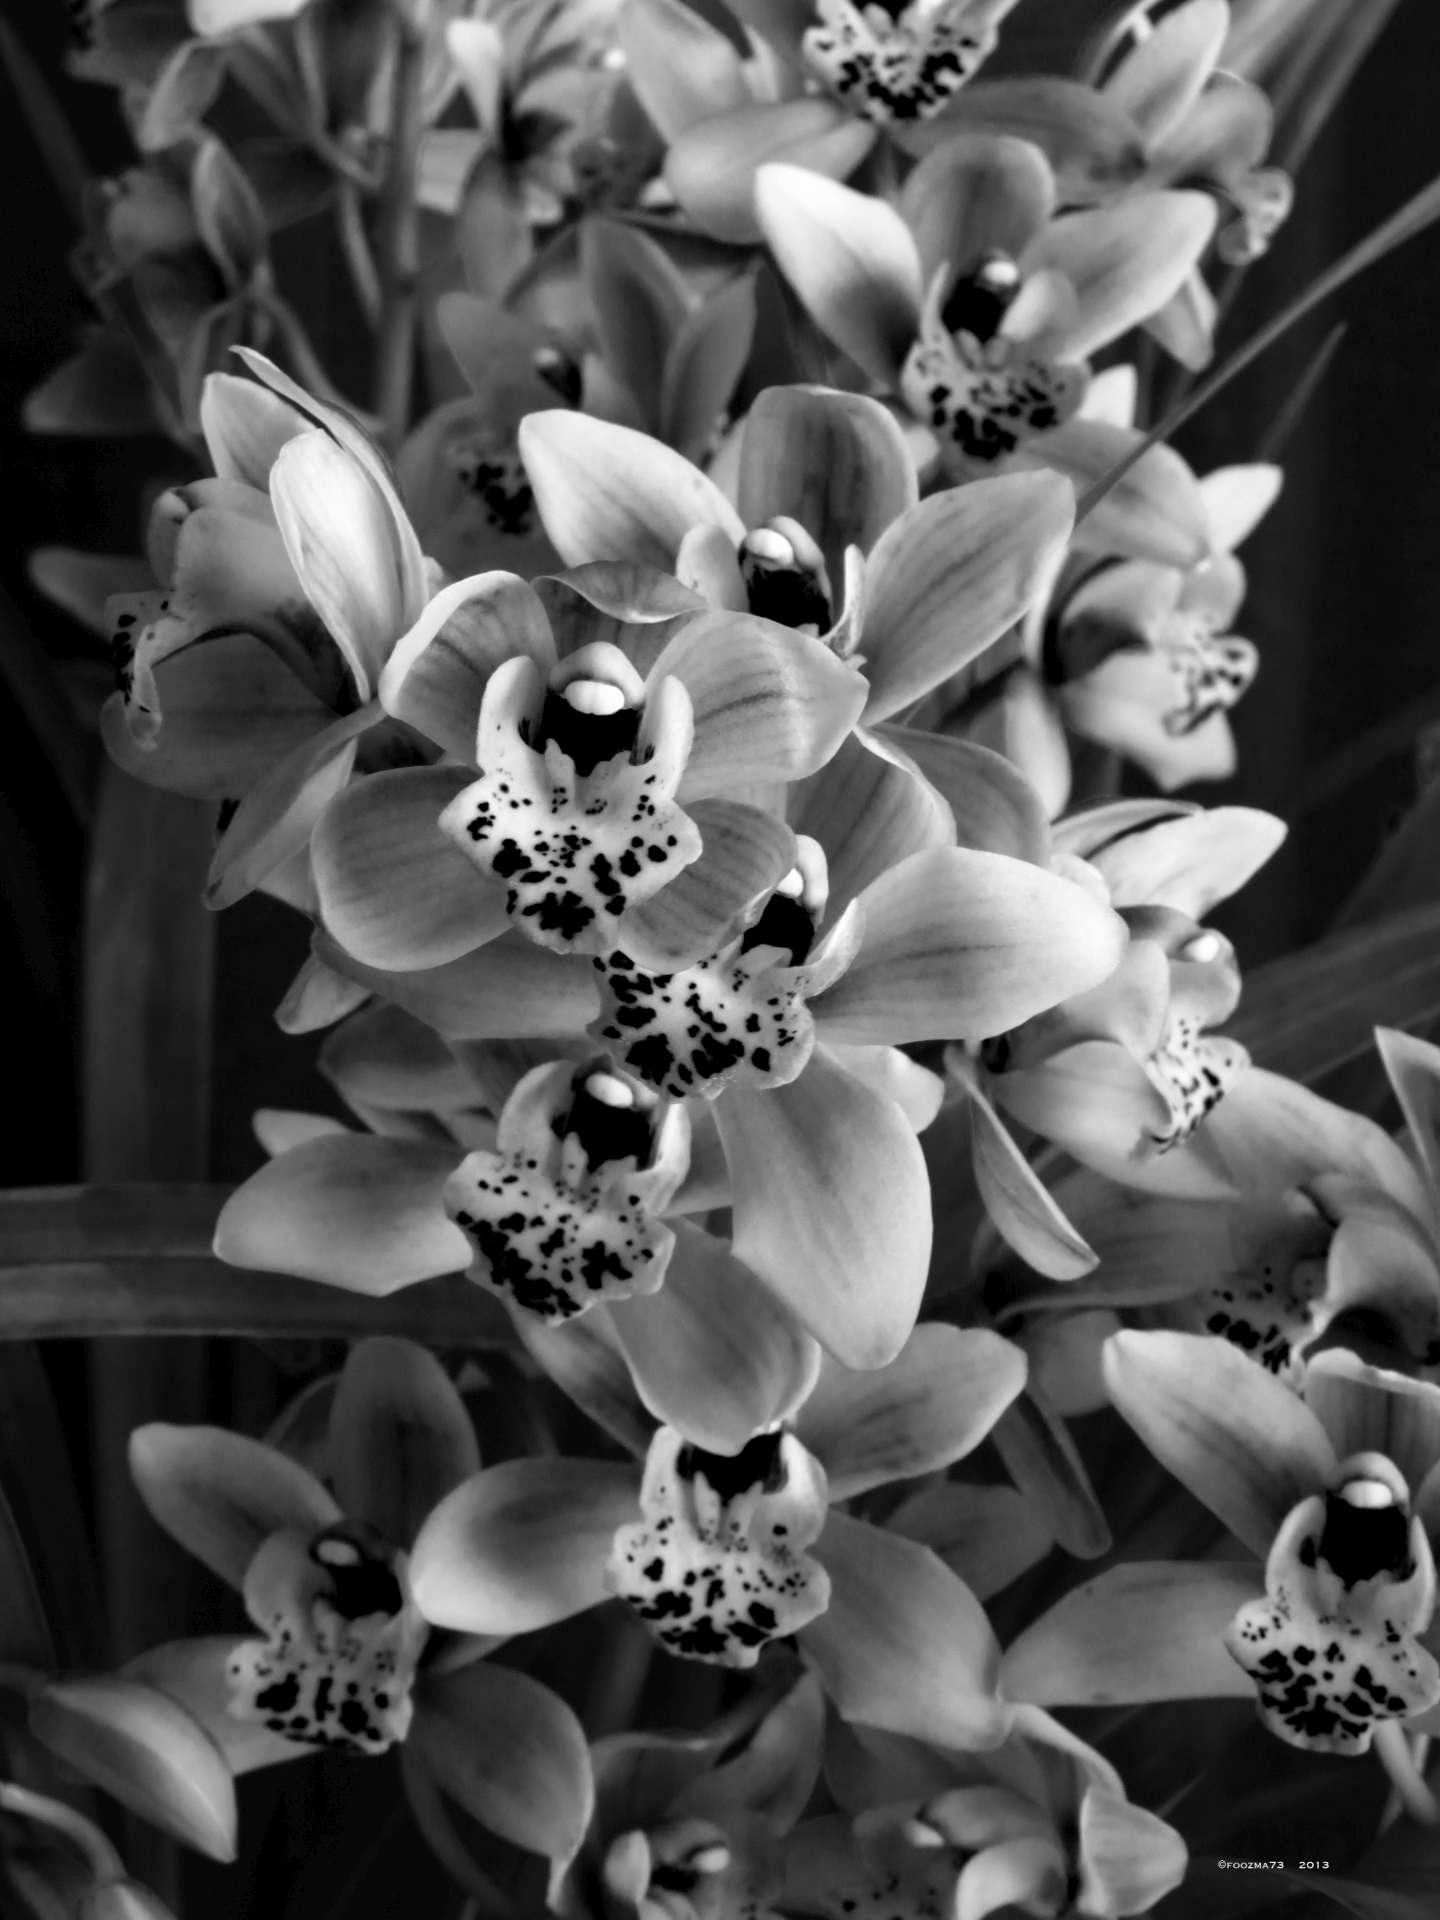 Cymbidium in Black and White by Jennifer A. Wheaton